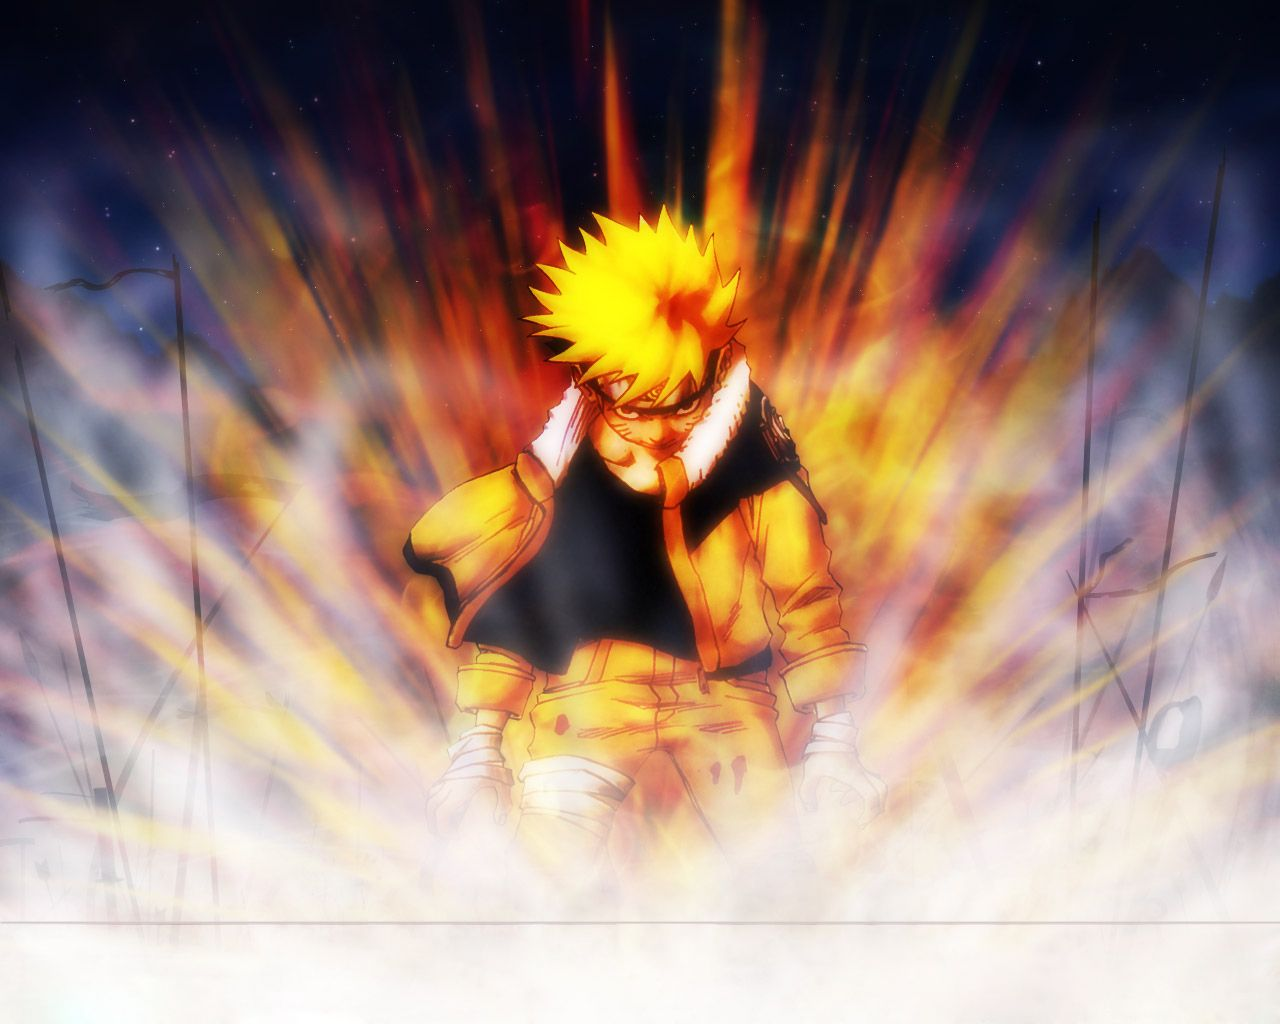 Popular Wallpaper Angry Naruto Uzumaki - ad0d04f29acdab1050530875de9a6d03  Photograph_759887      .jpg